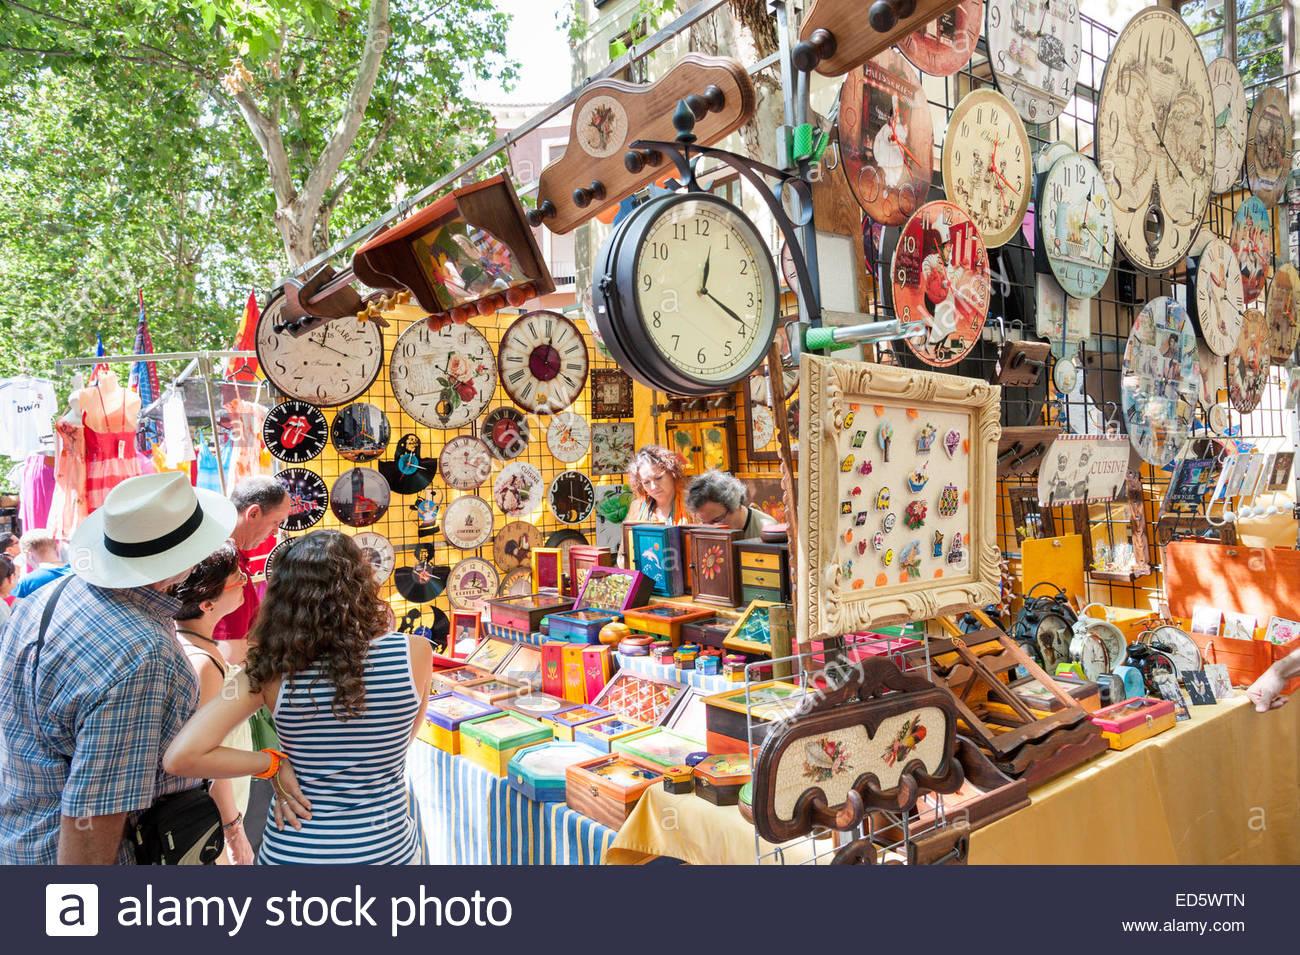 Rastro market stall decorative household goods, La Latina, Madrid, Spain - Stock Image